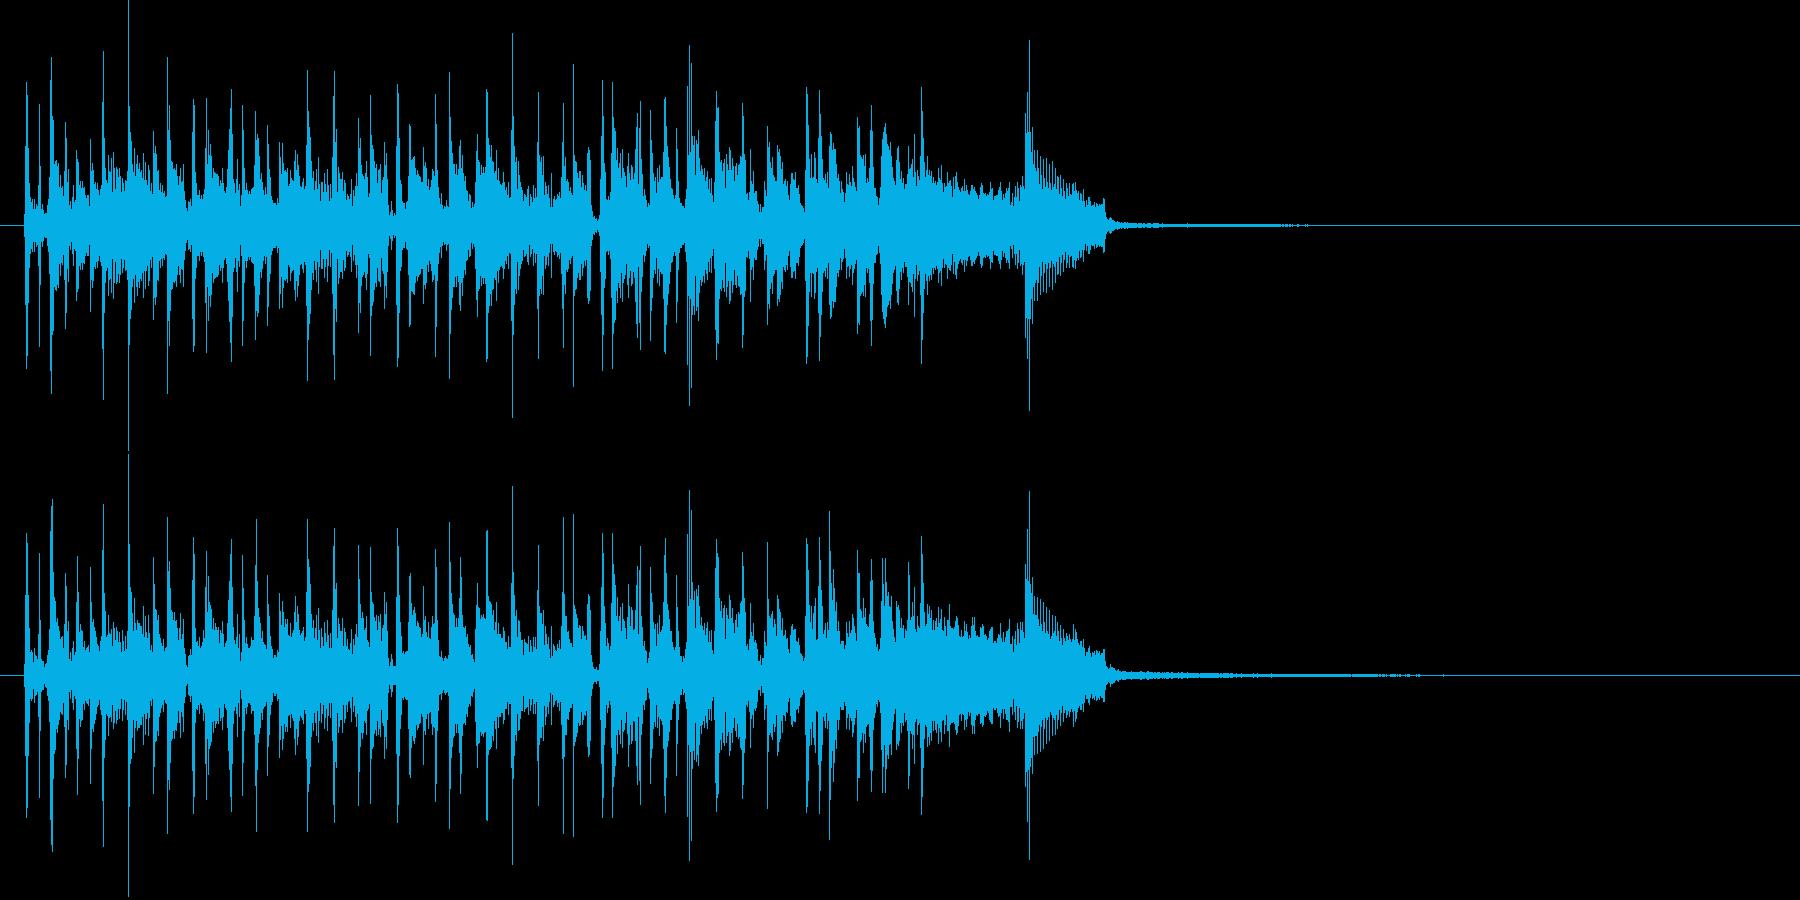 Bassスラップ風アイキャッチの再生済みの波形